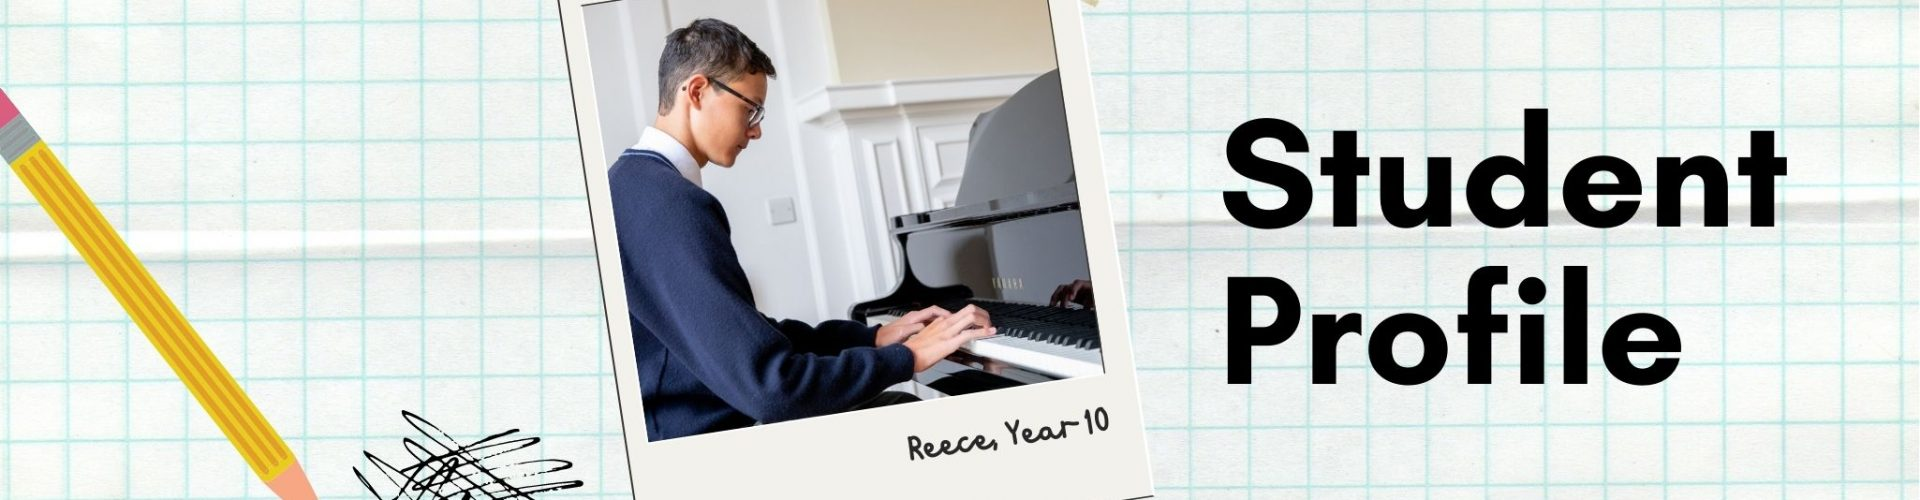 Reece Student Profile Leweston Music